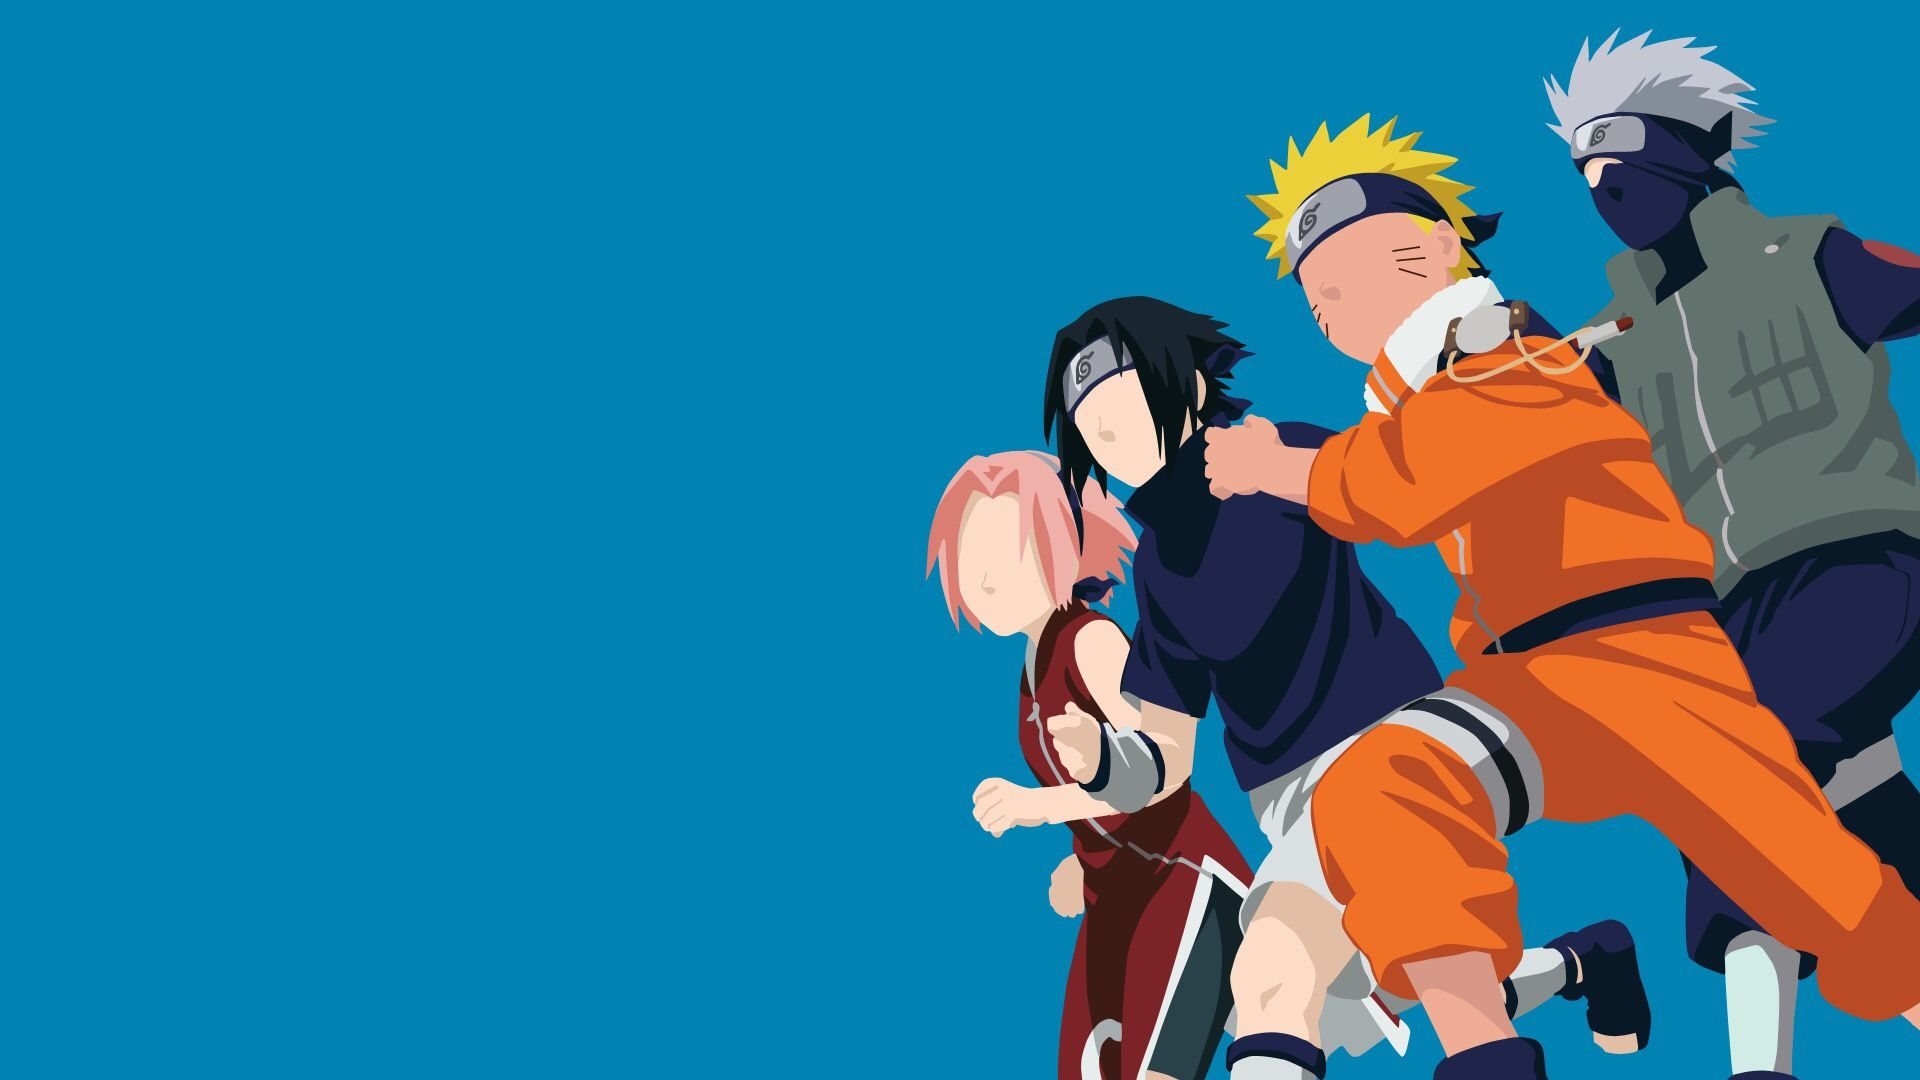 Team 7 Naruto Series Wallpaper Naruto Wallpaper Wallpaper Naruto Shippuden Anime Naruto